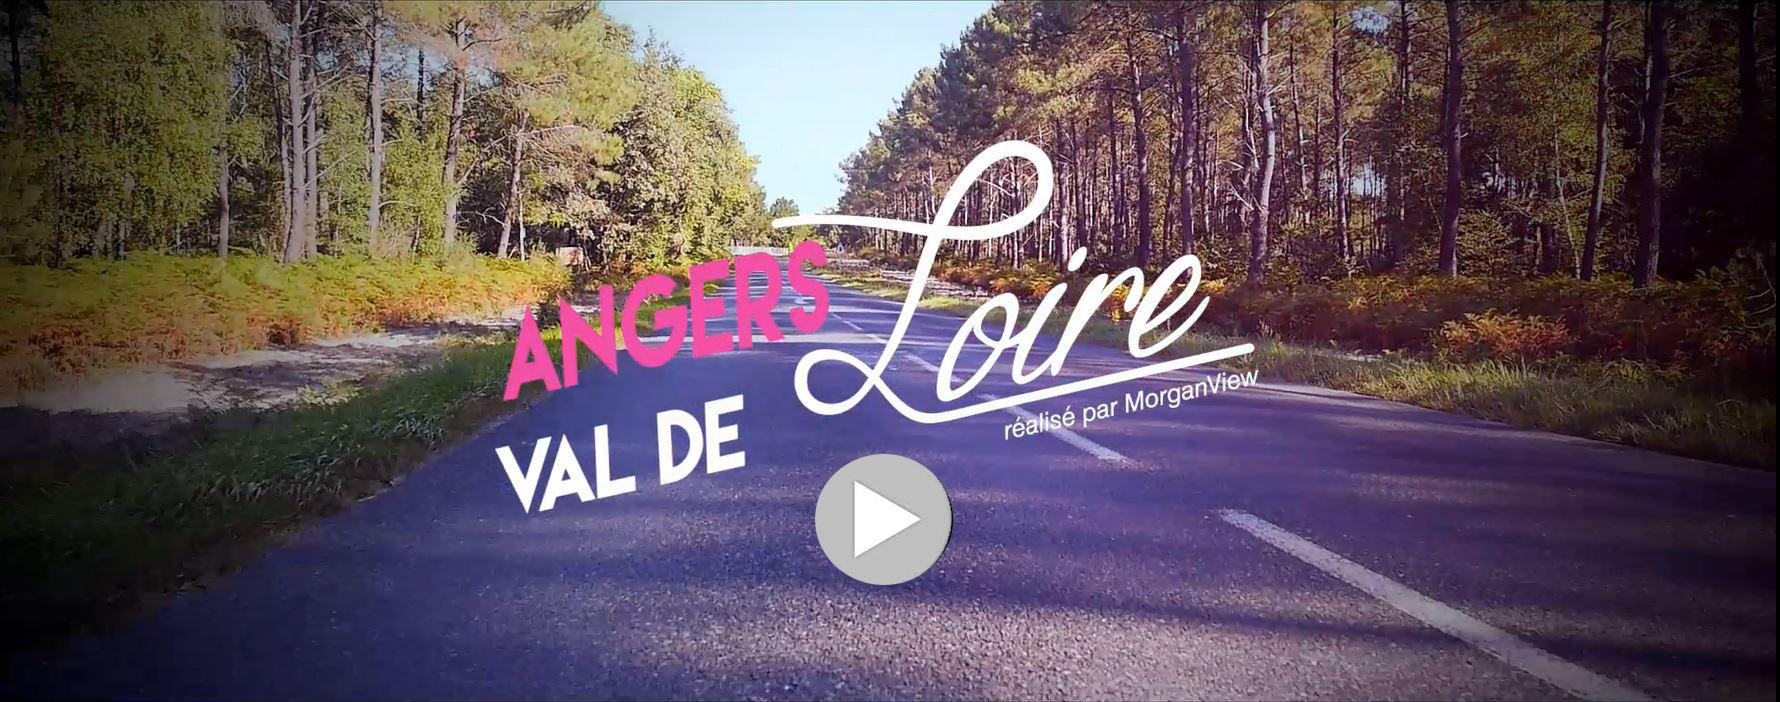 video_road_movie_angers_val_de_loire